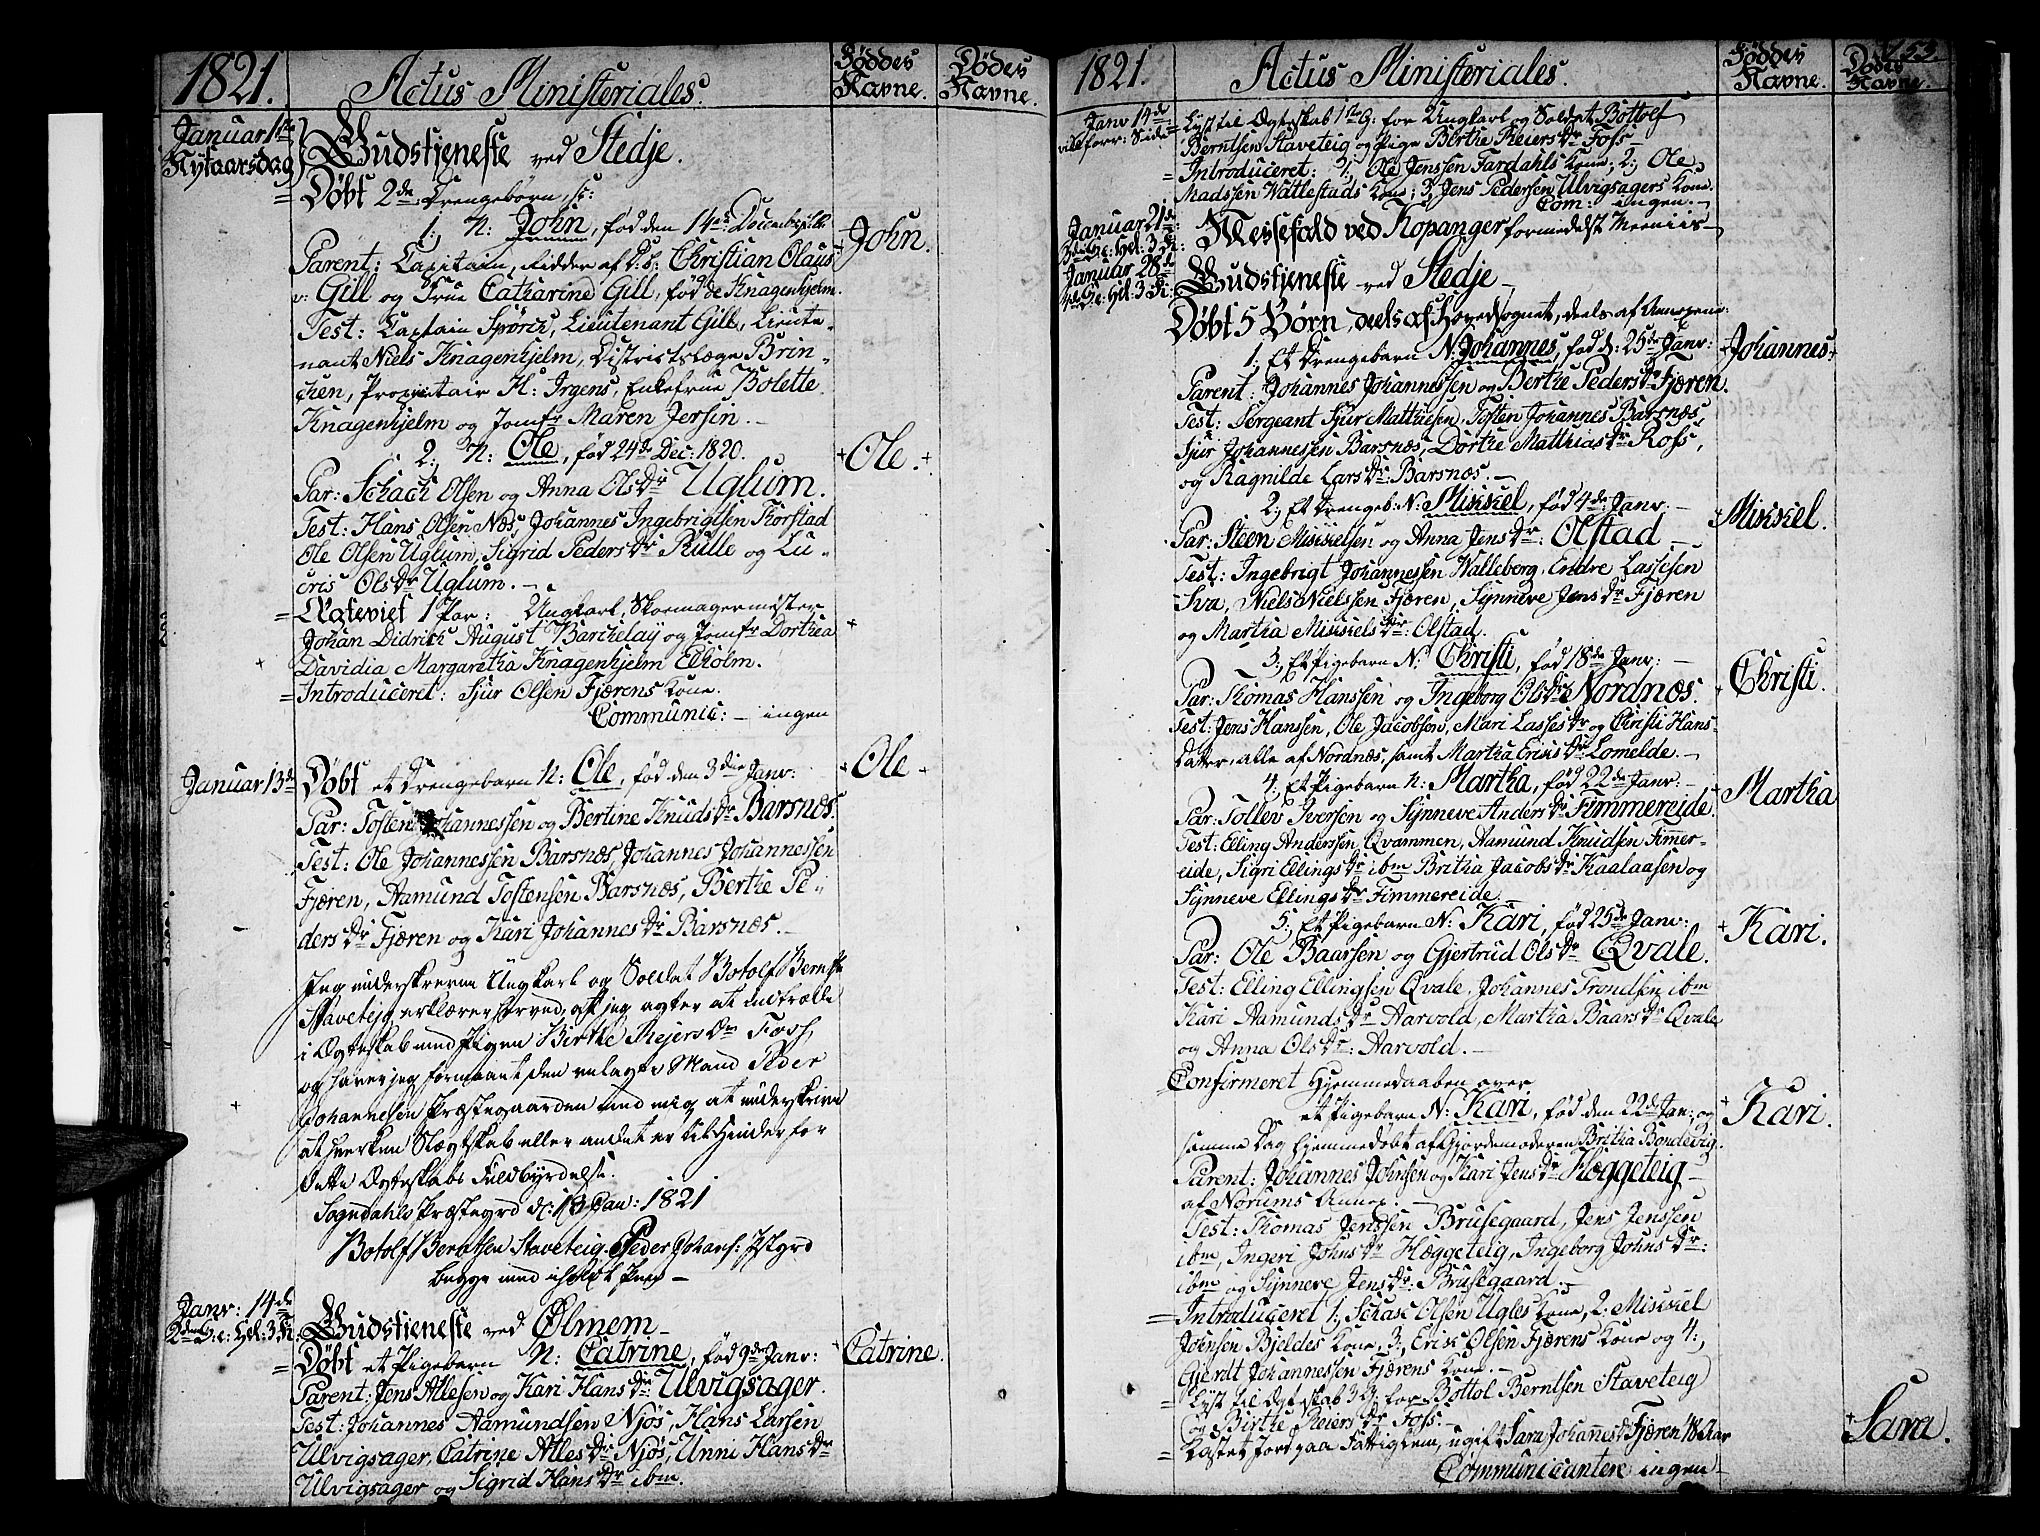 SAB, Sogndal sokneprestembete, H/Haa/Haaa/L0009: Ministerialbok nr. A 9, 1809-1821, s. 153